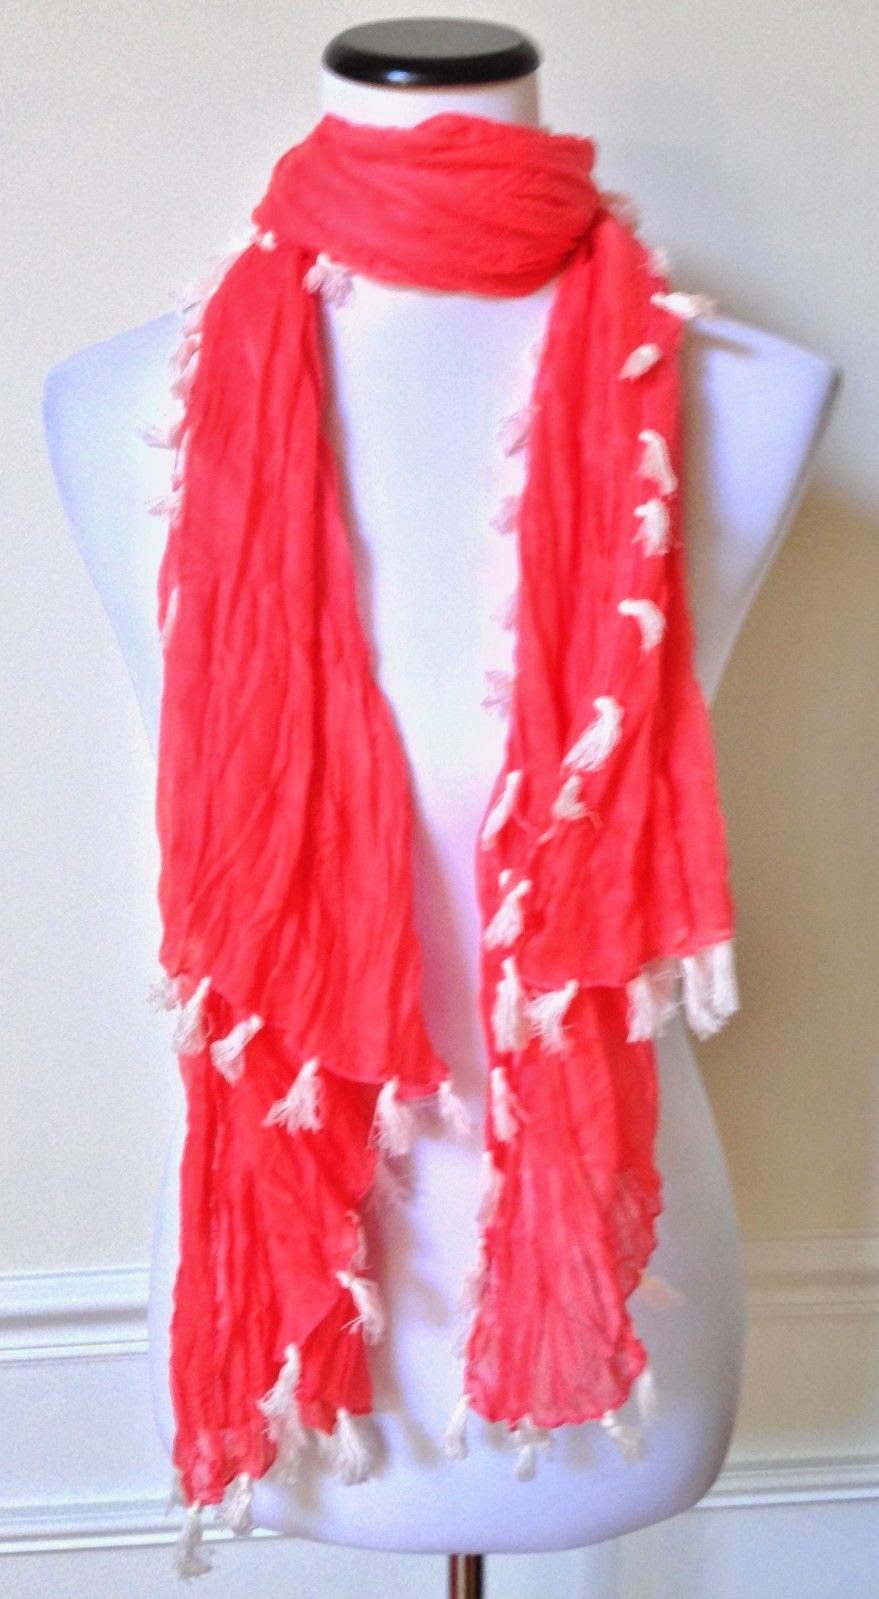 "NWOT CAPELLI Bright Coral Orange Ivory Tassel Knit Scarf Wrap Shawl 40"" x 65"""